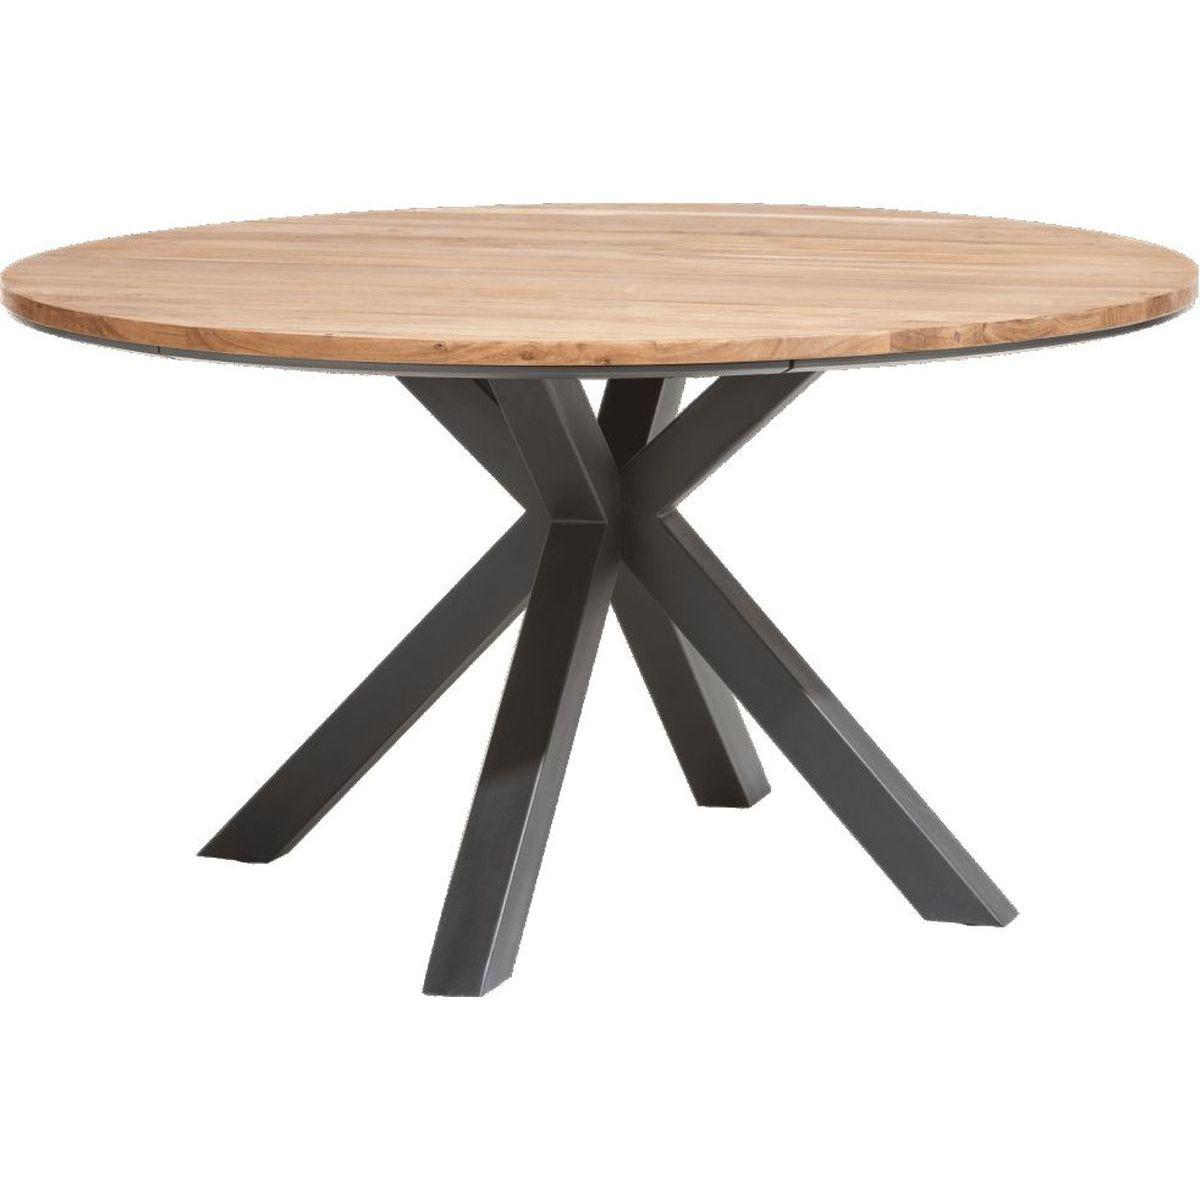 Table ronde COLOMBO Xooon bois Kikar smoked 150cm